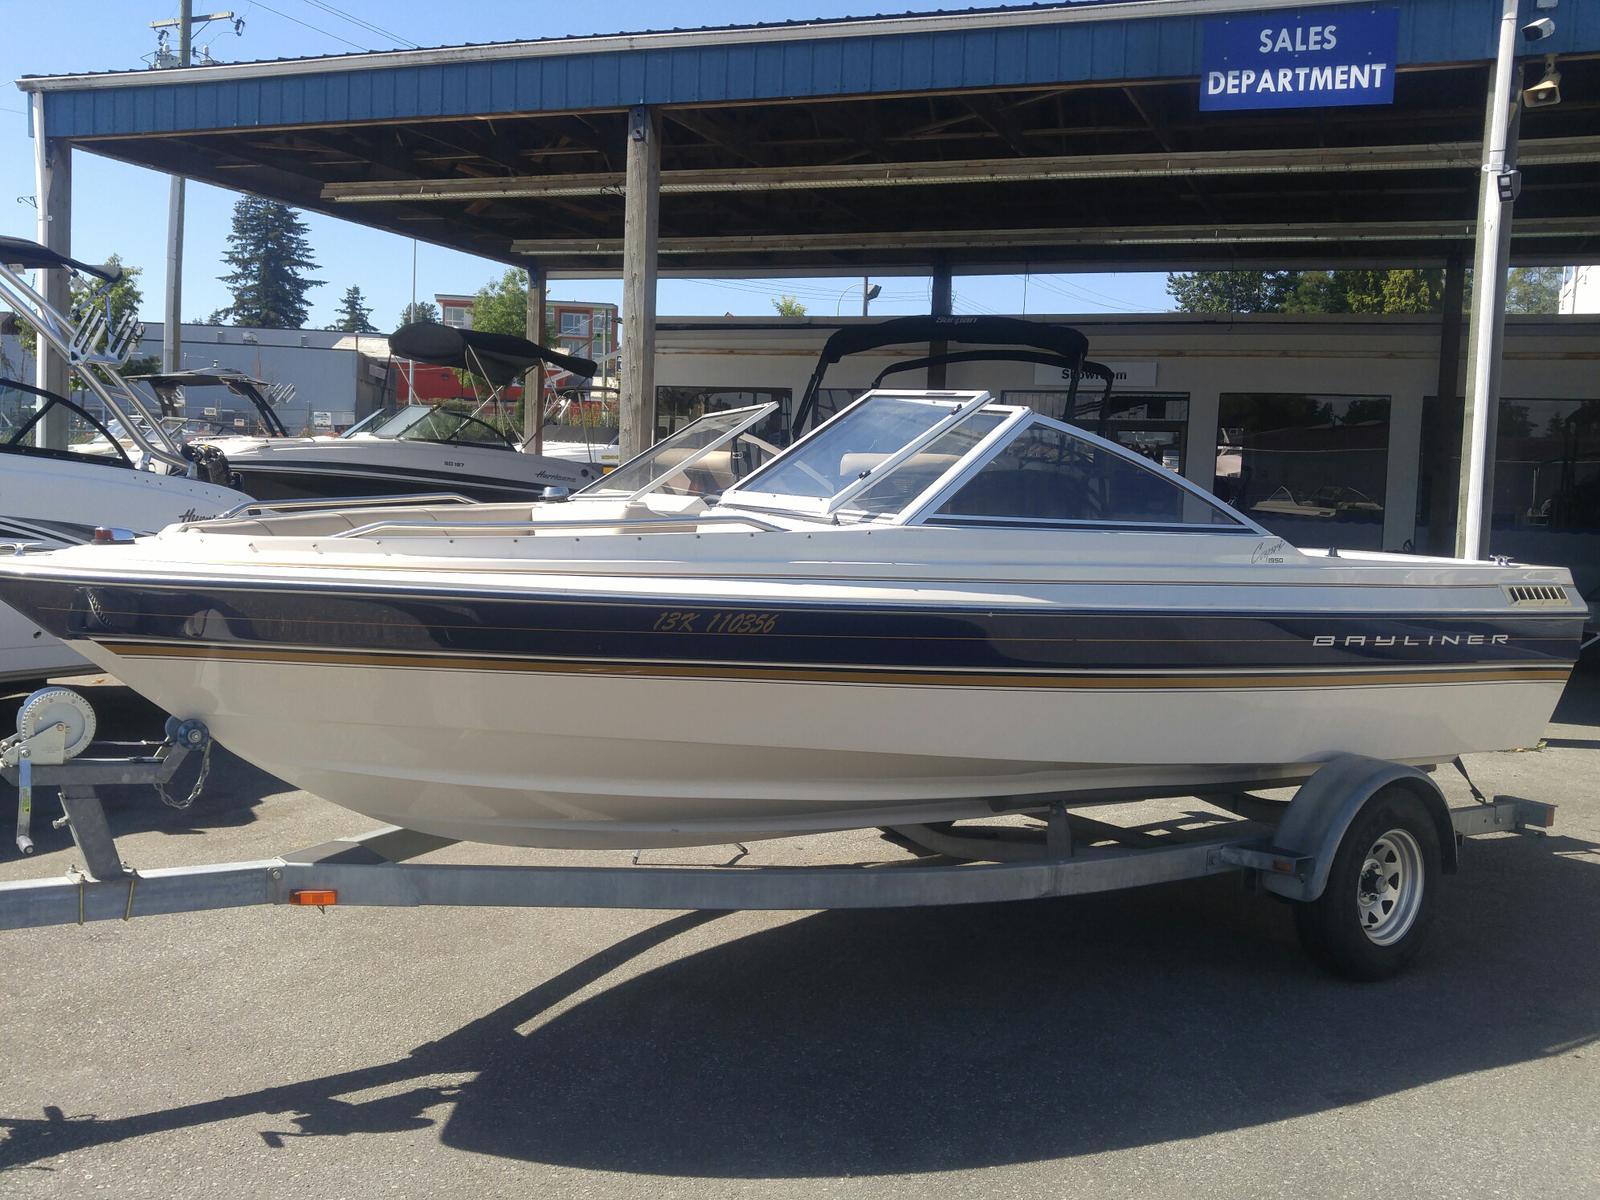 1996 Bayliner 1950 for sale in Surrey, BC  Breakwater Marine